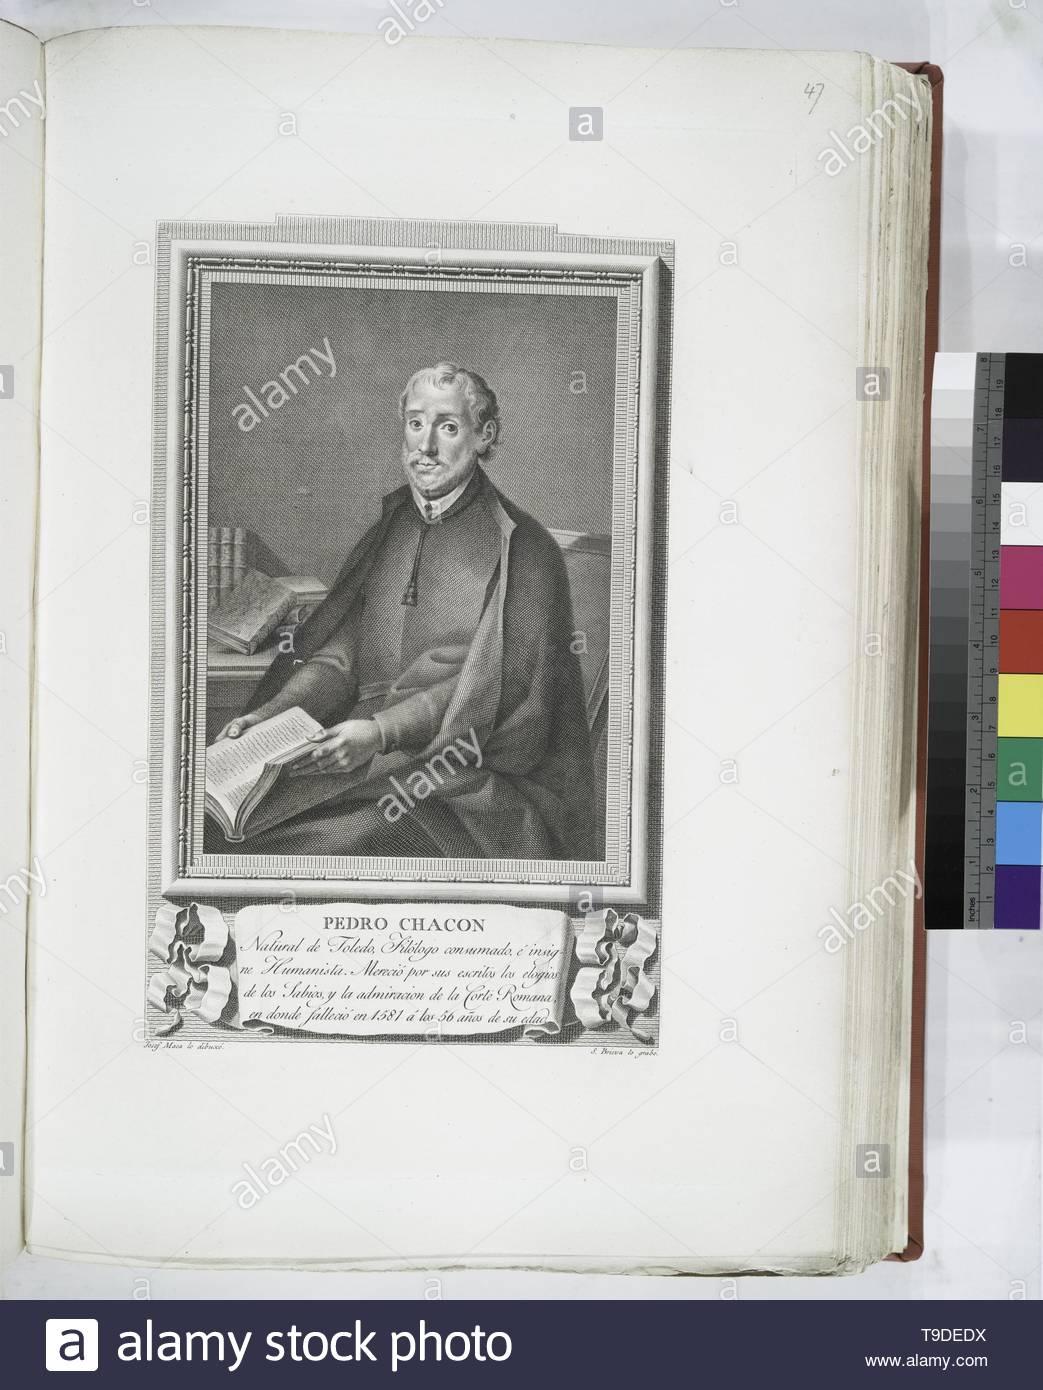 Maea,José(1759-1826)-Pedro Chacon - Stock Image